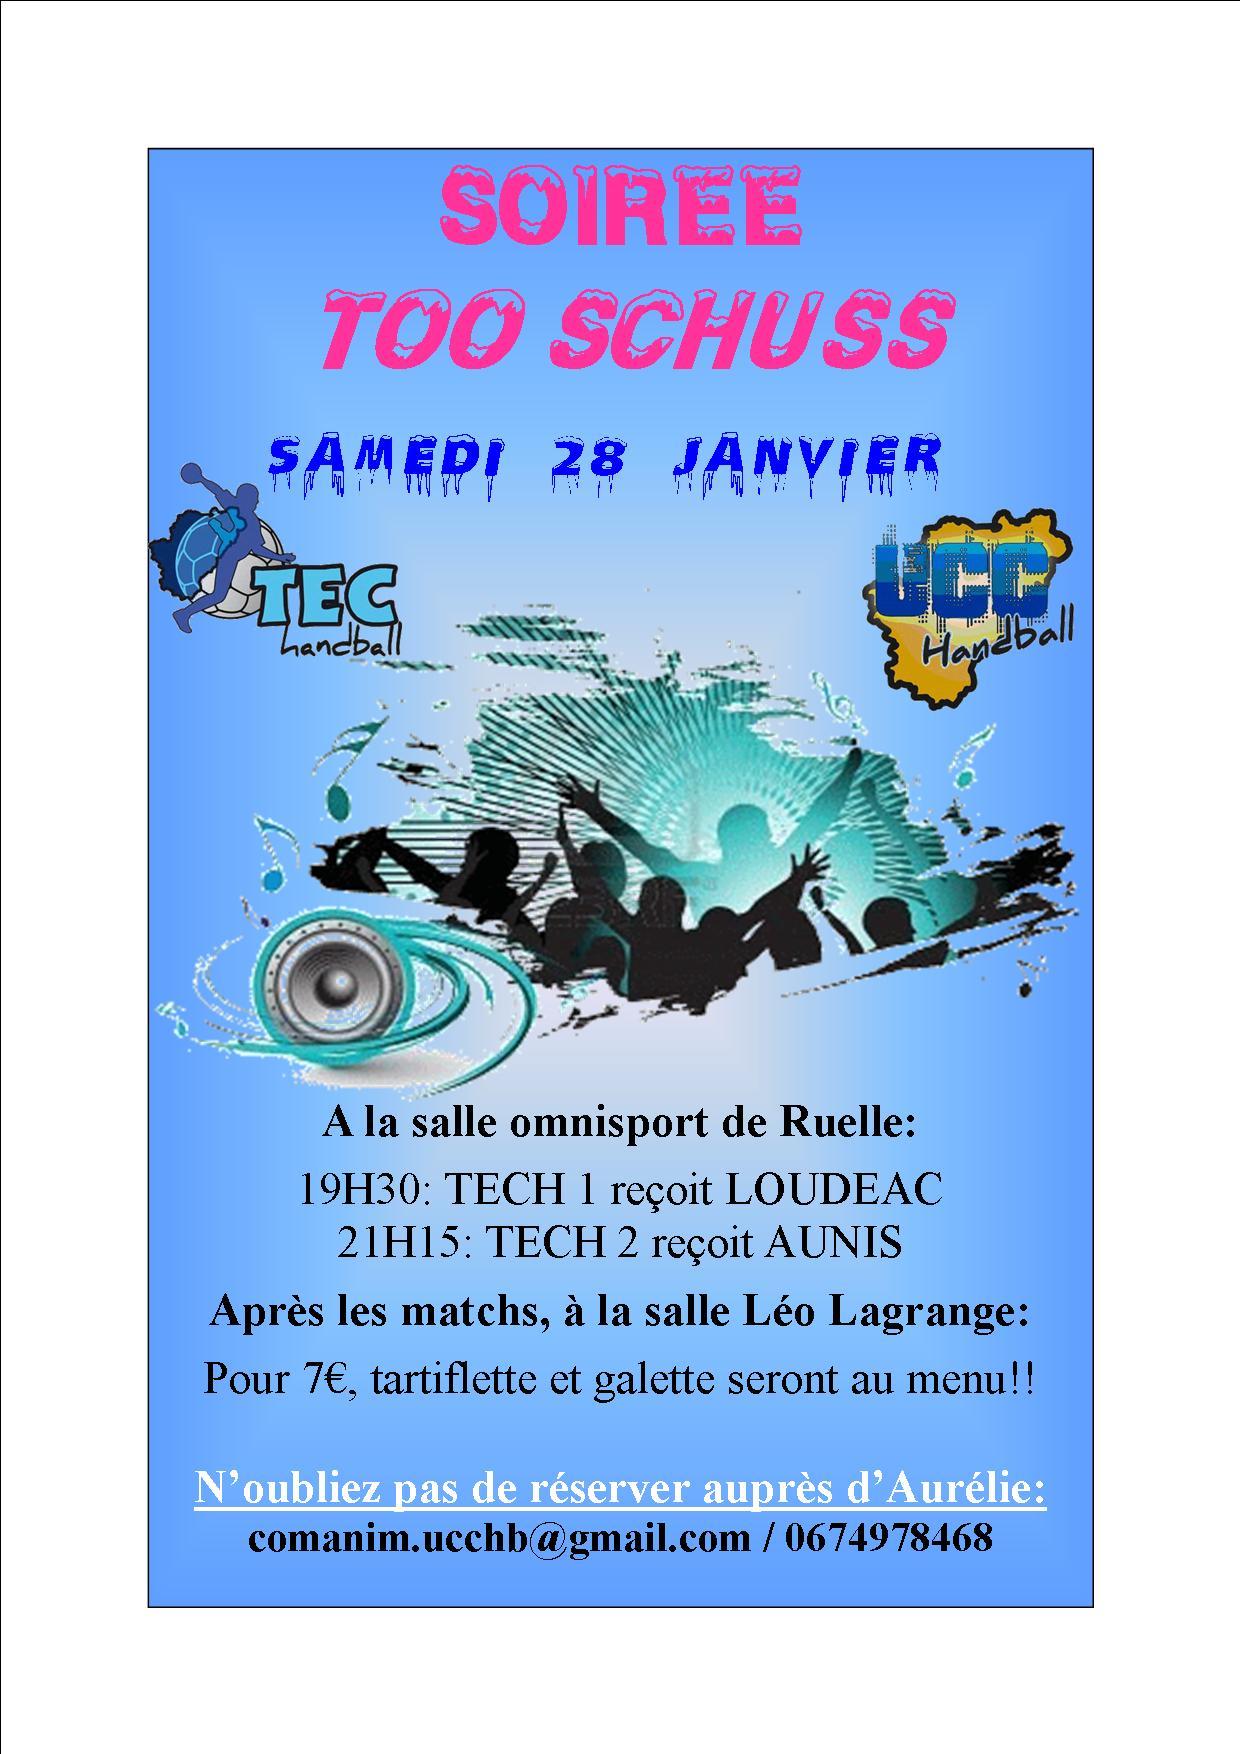 Soirée TOO SCHUSS